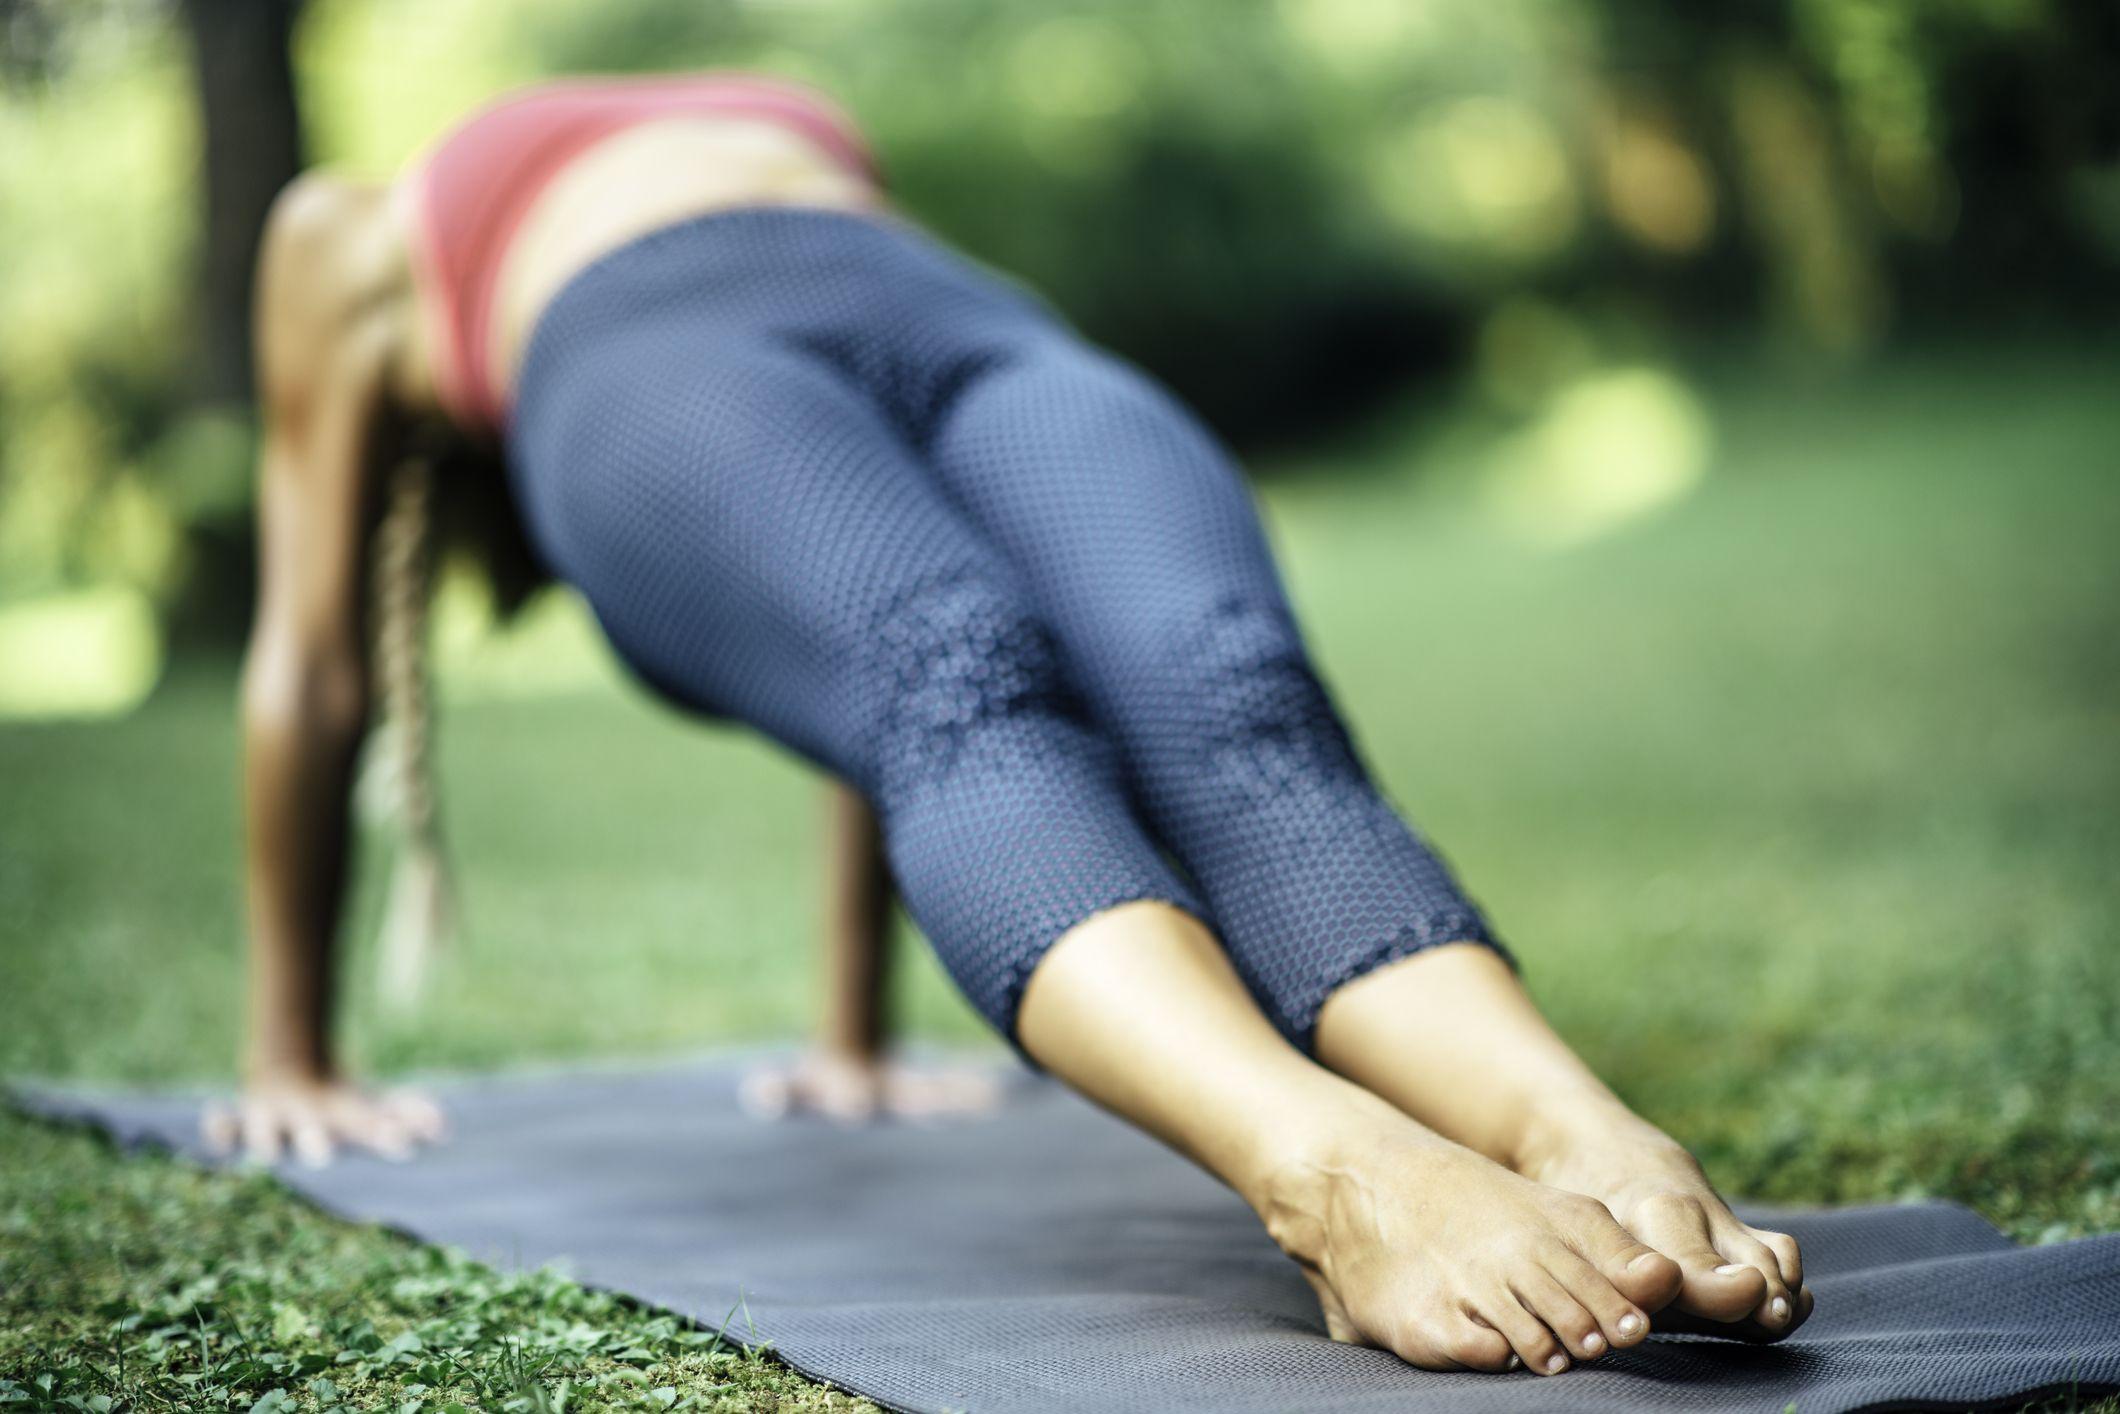 Exercice des muscles profonds : un exercice pour muscler ...